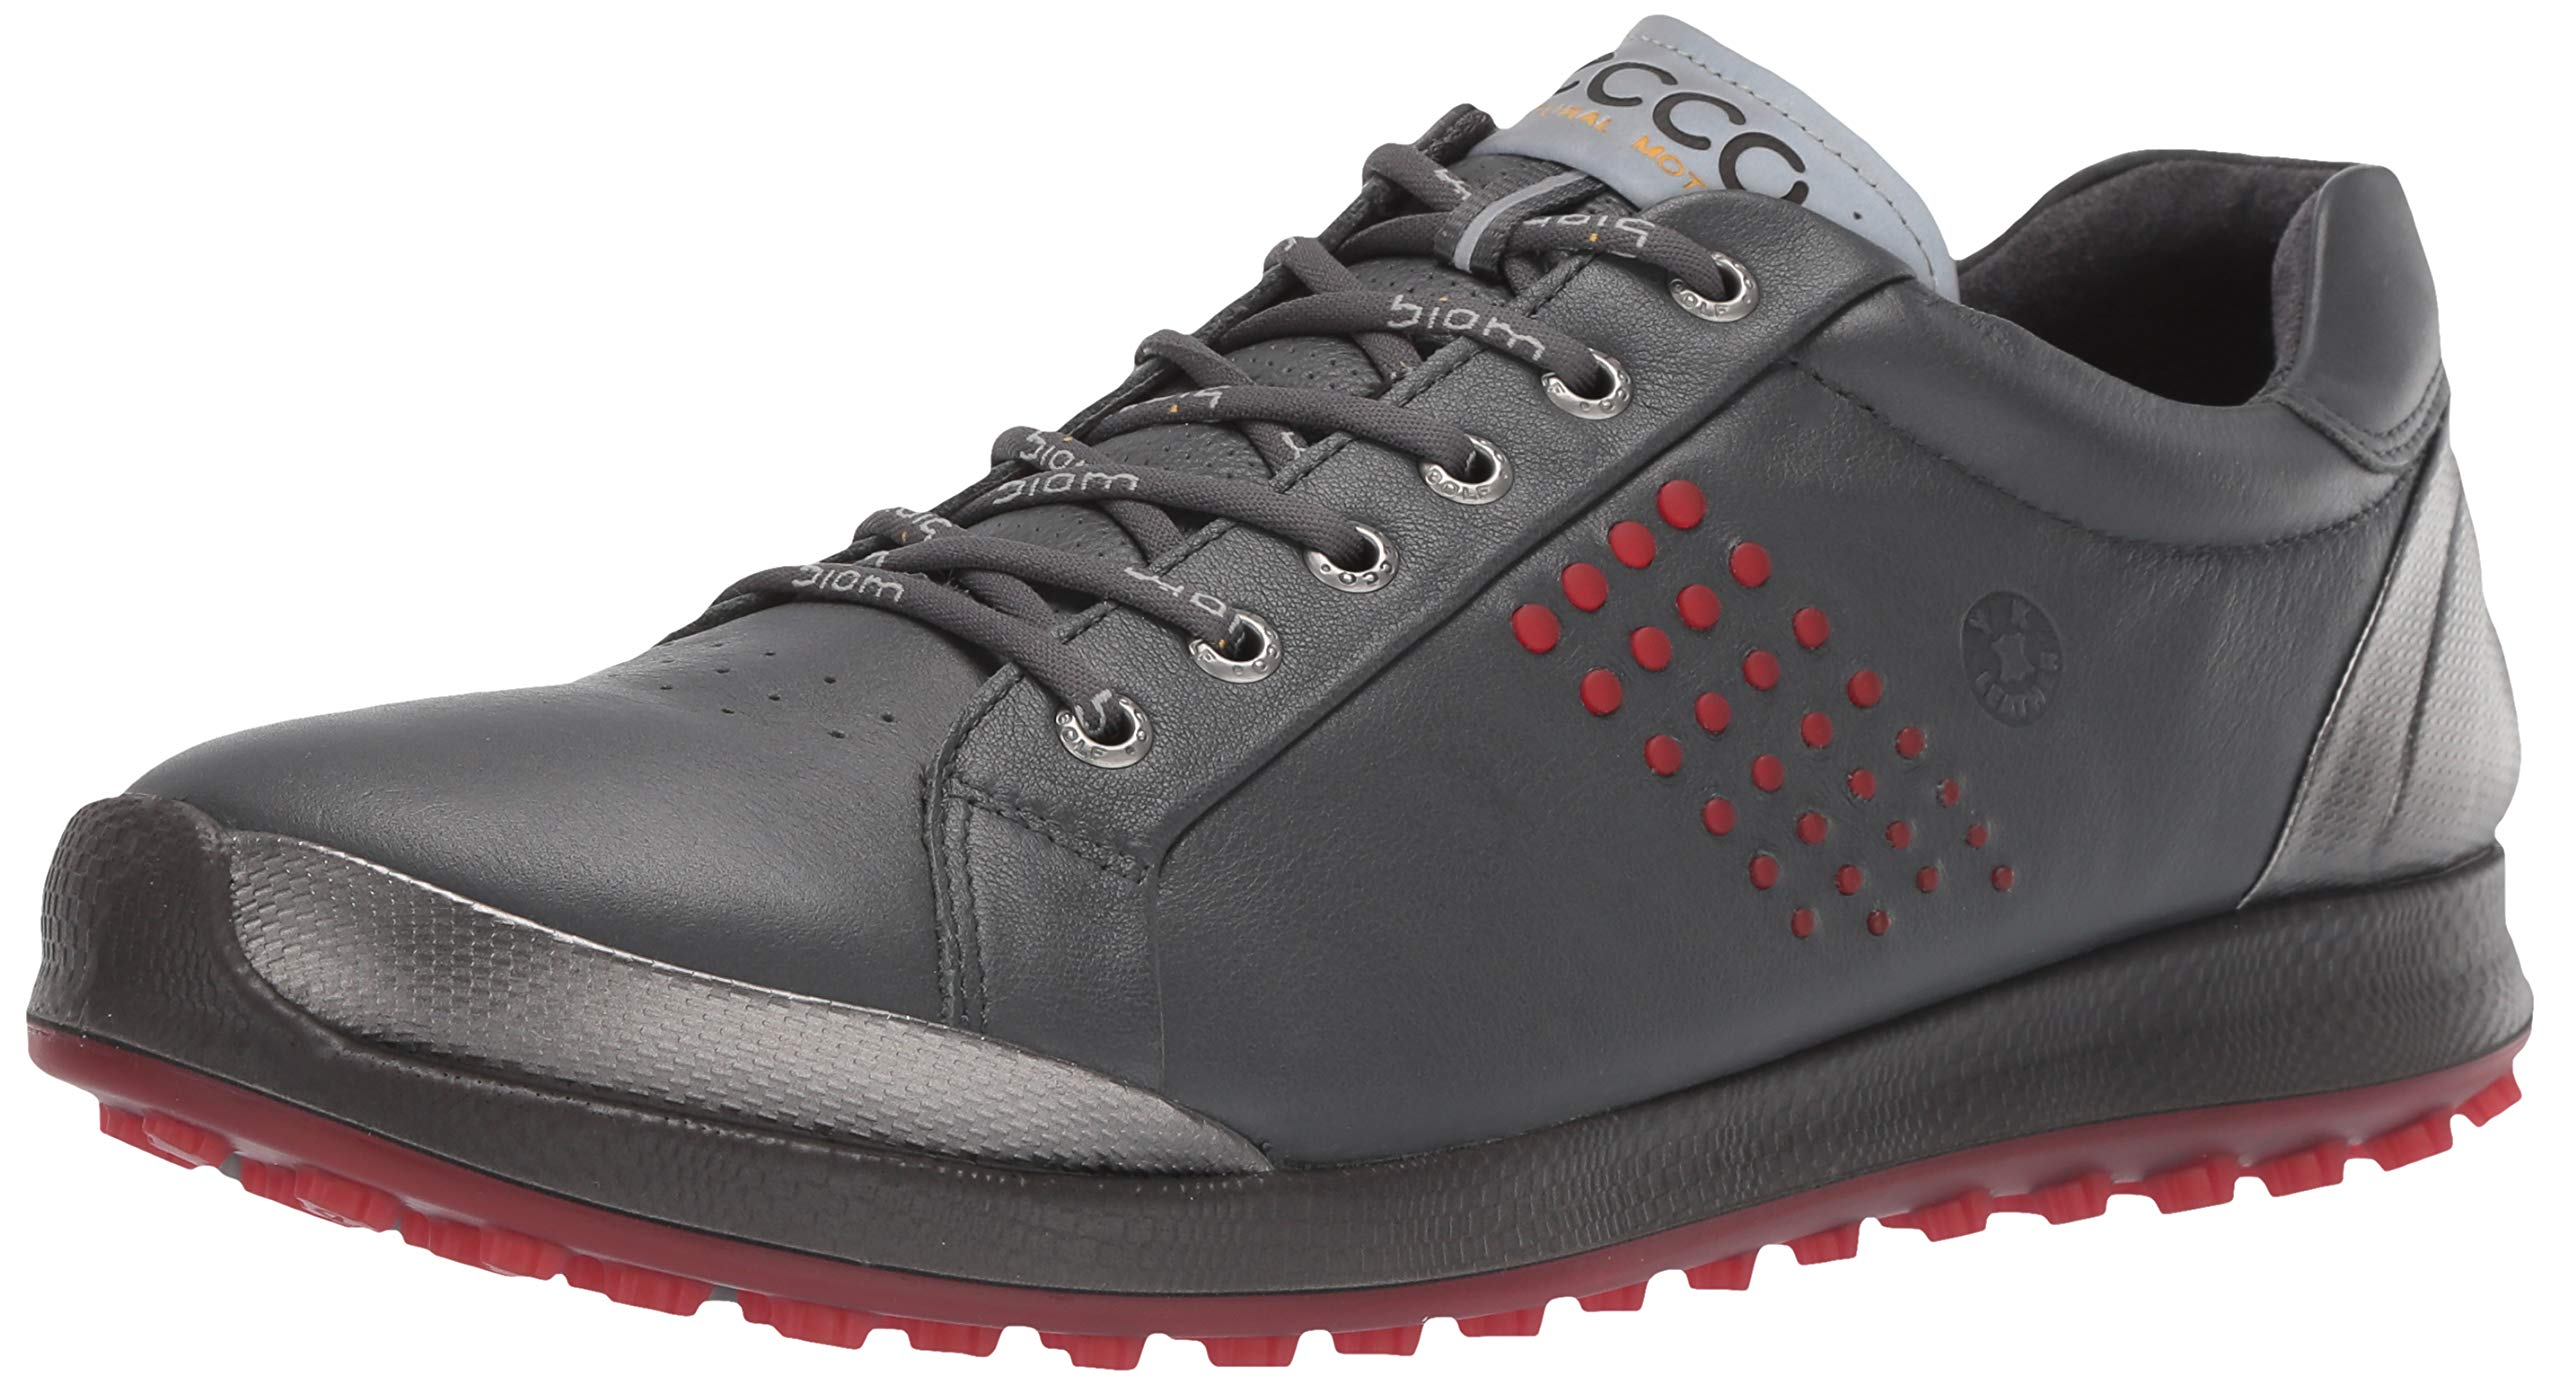 de9ceafbcf17d5 Best Rated in Men's Golf Shoes & Helpful Customer Reviews - Amazon.com